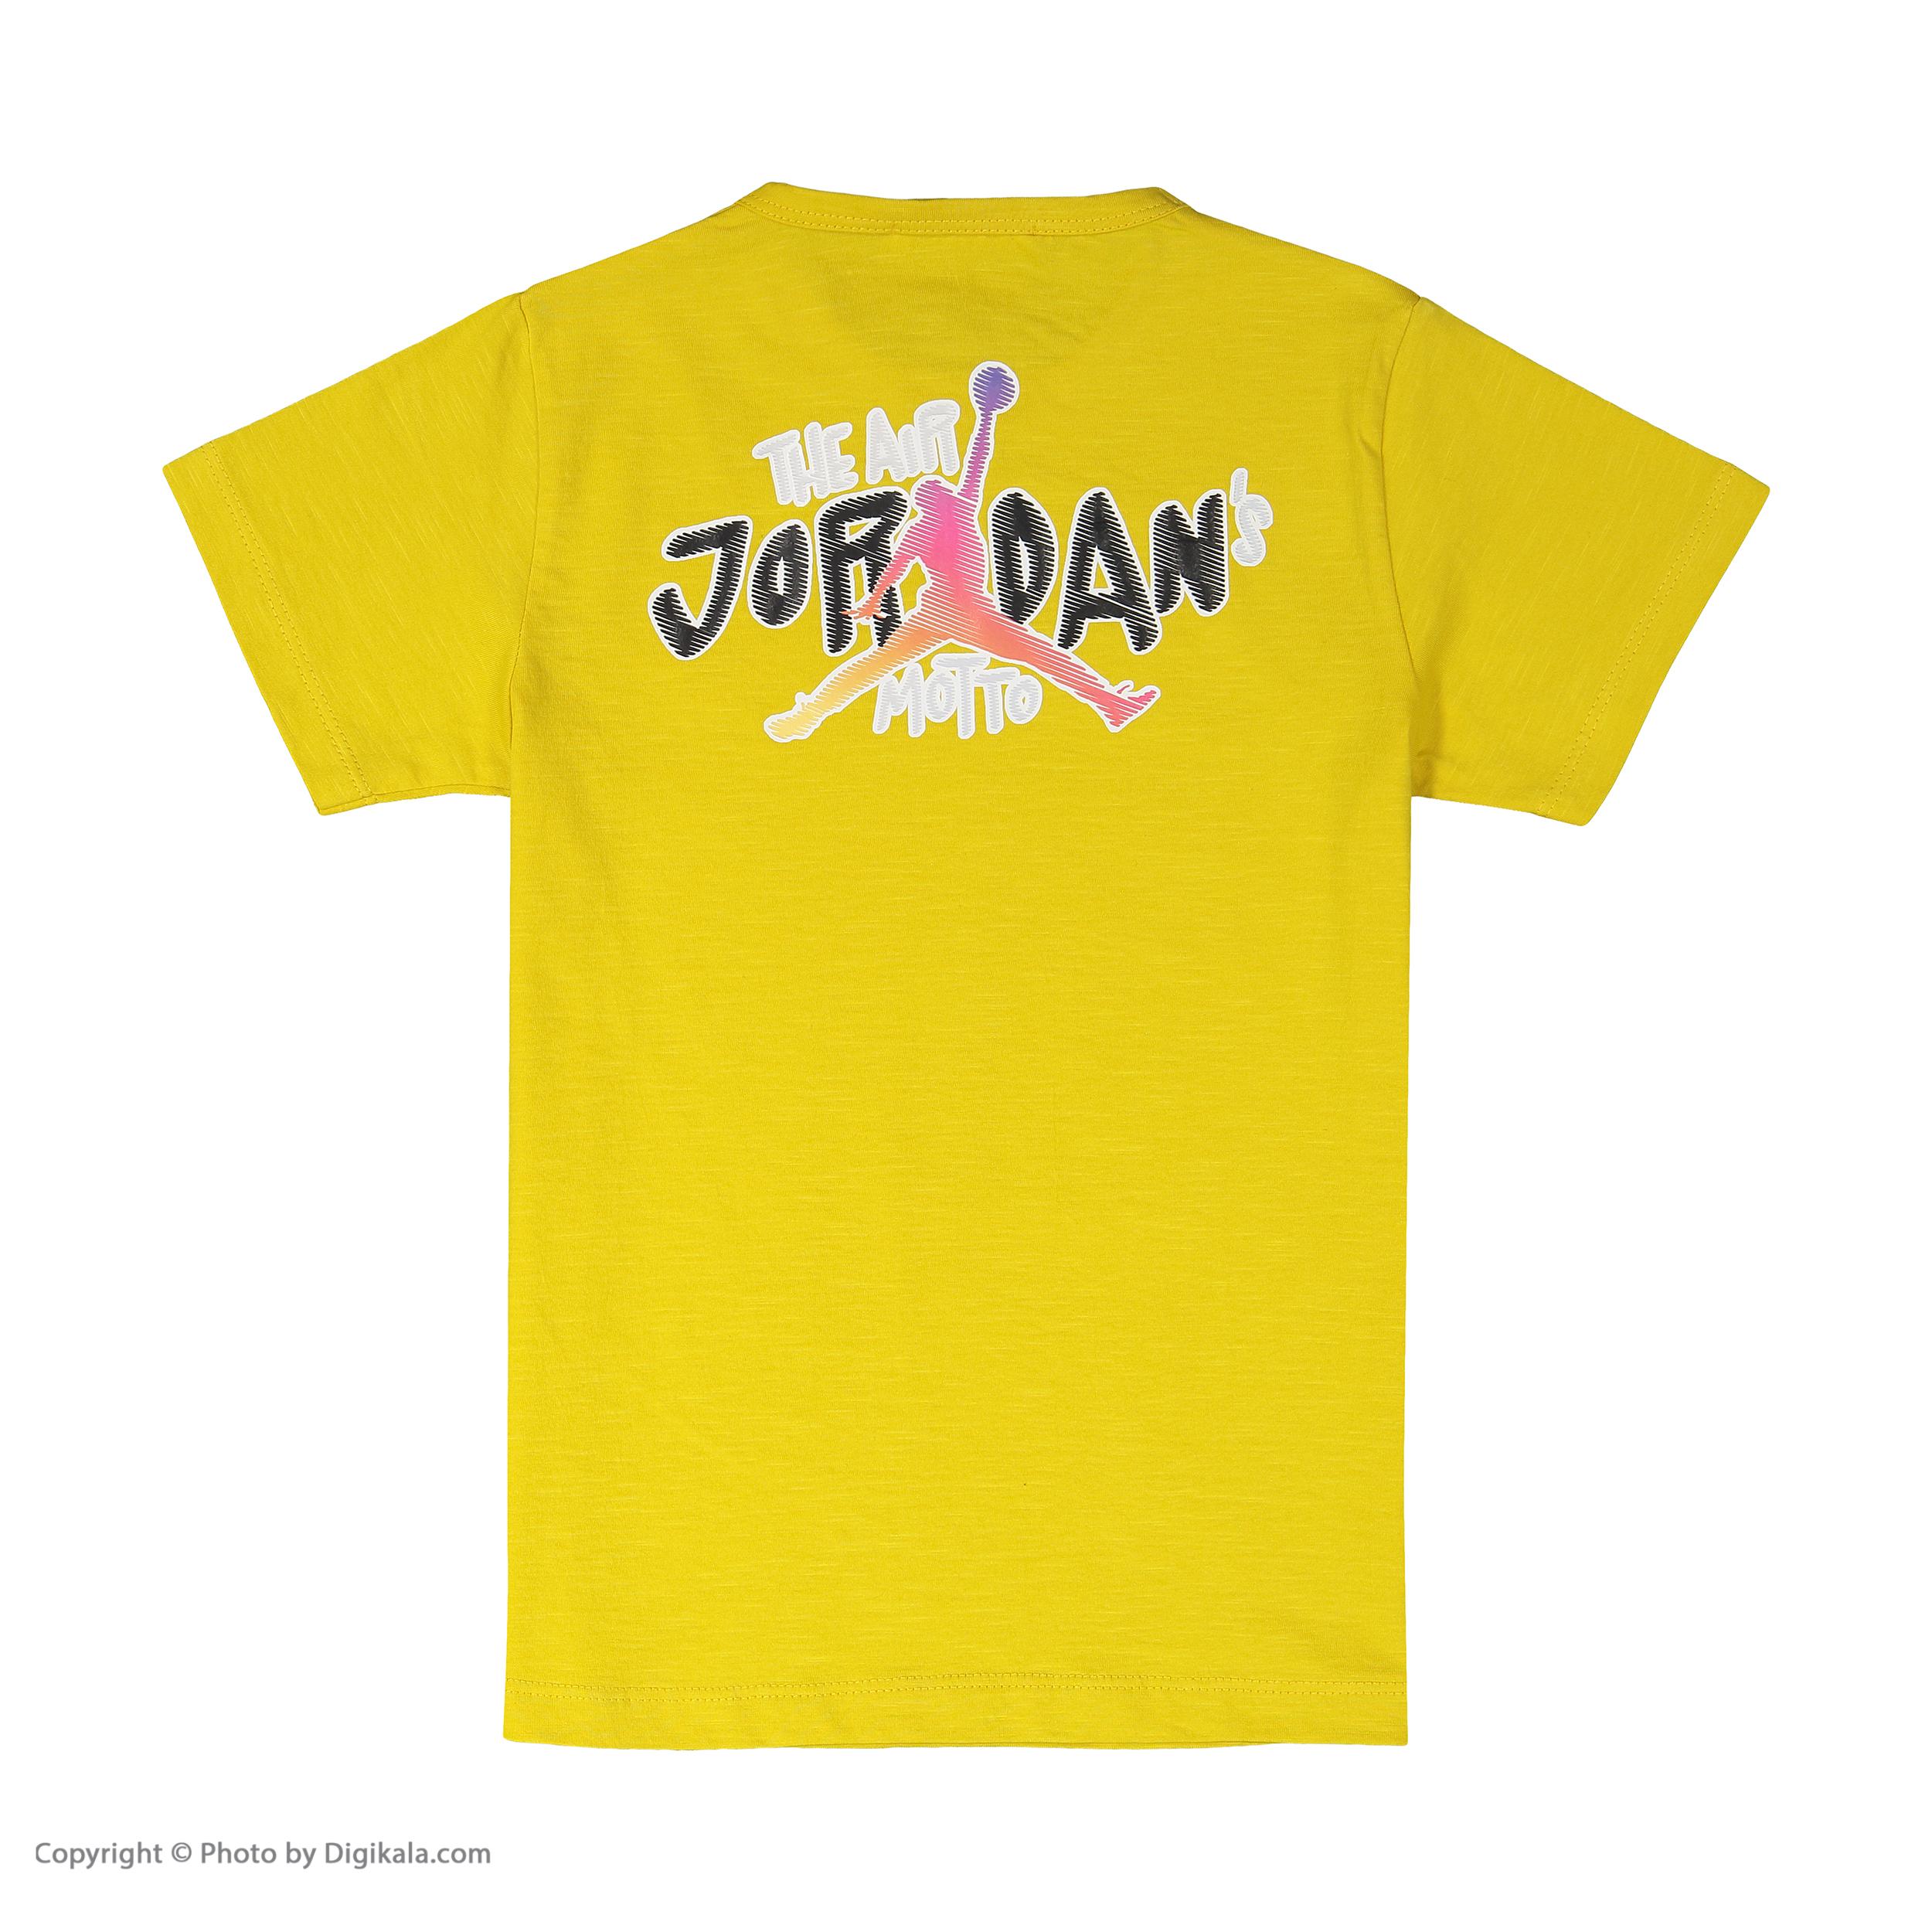 تی شرت پسرانه بی کی مدل 2211120-16